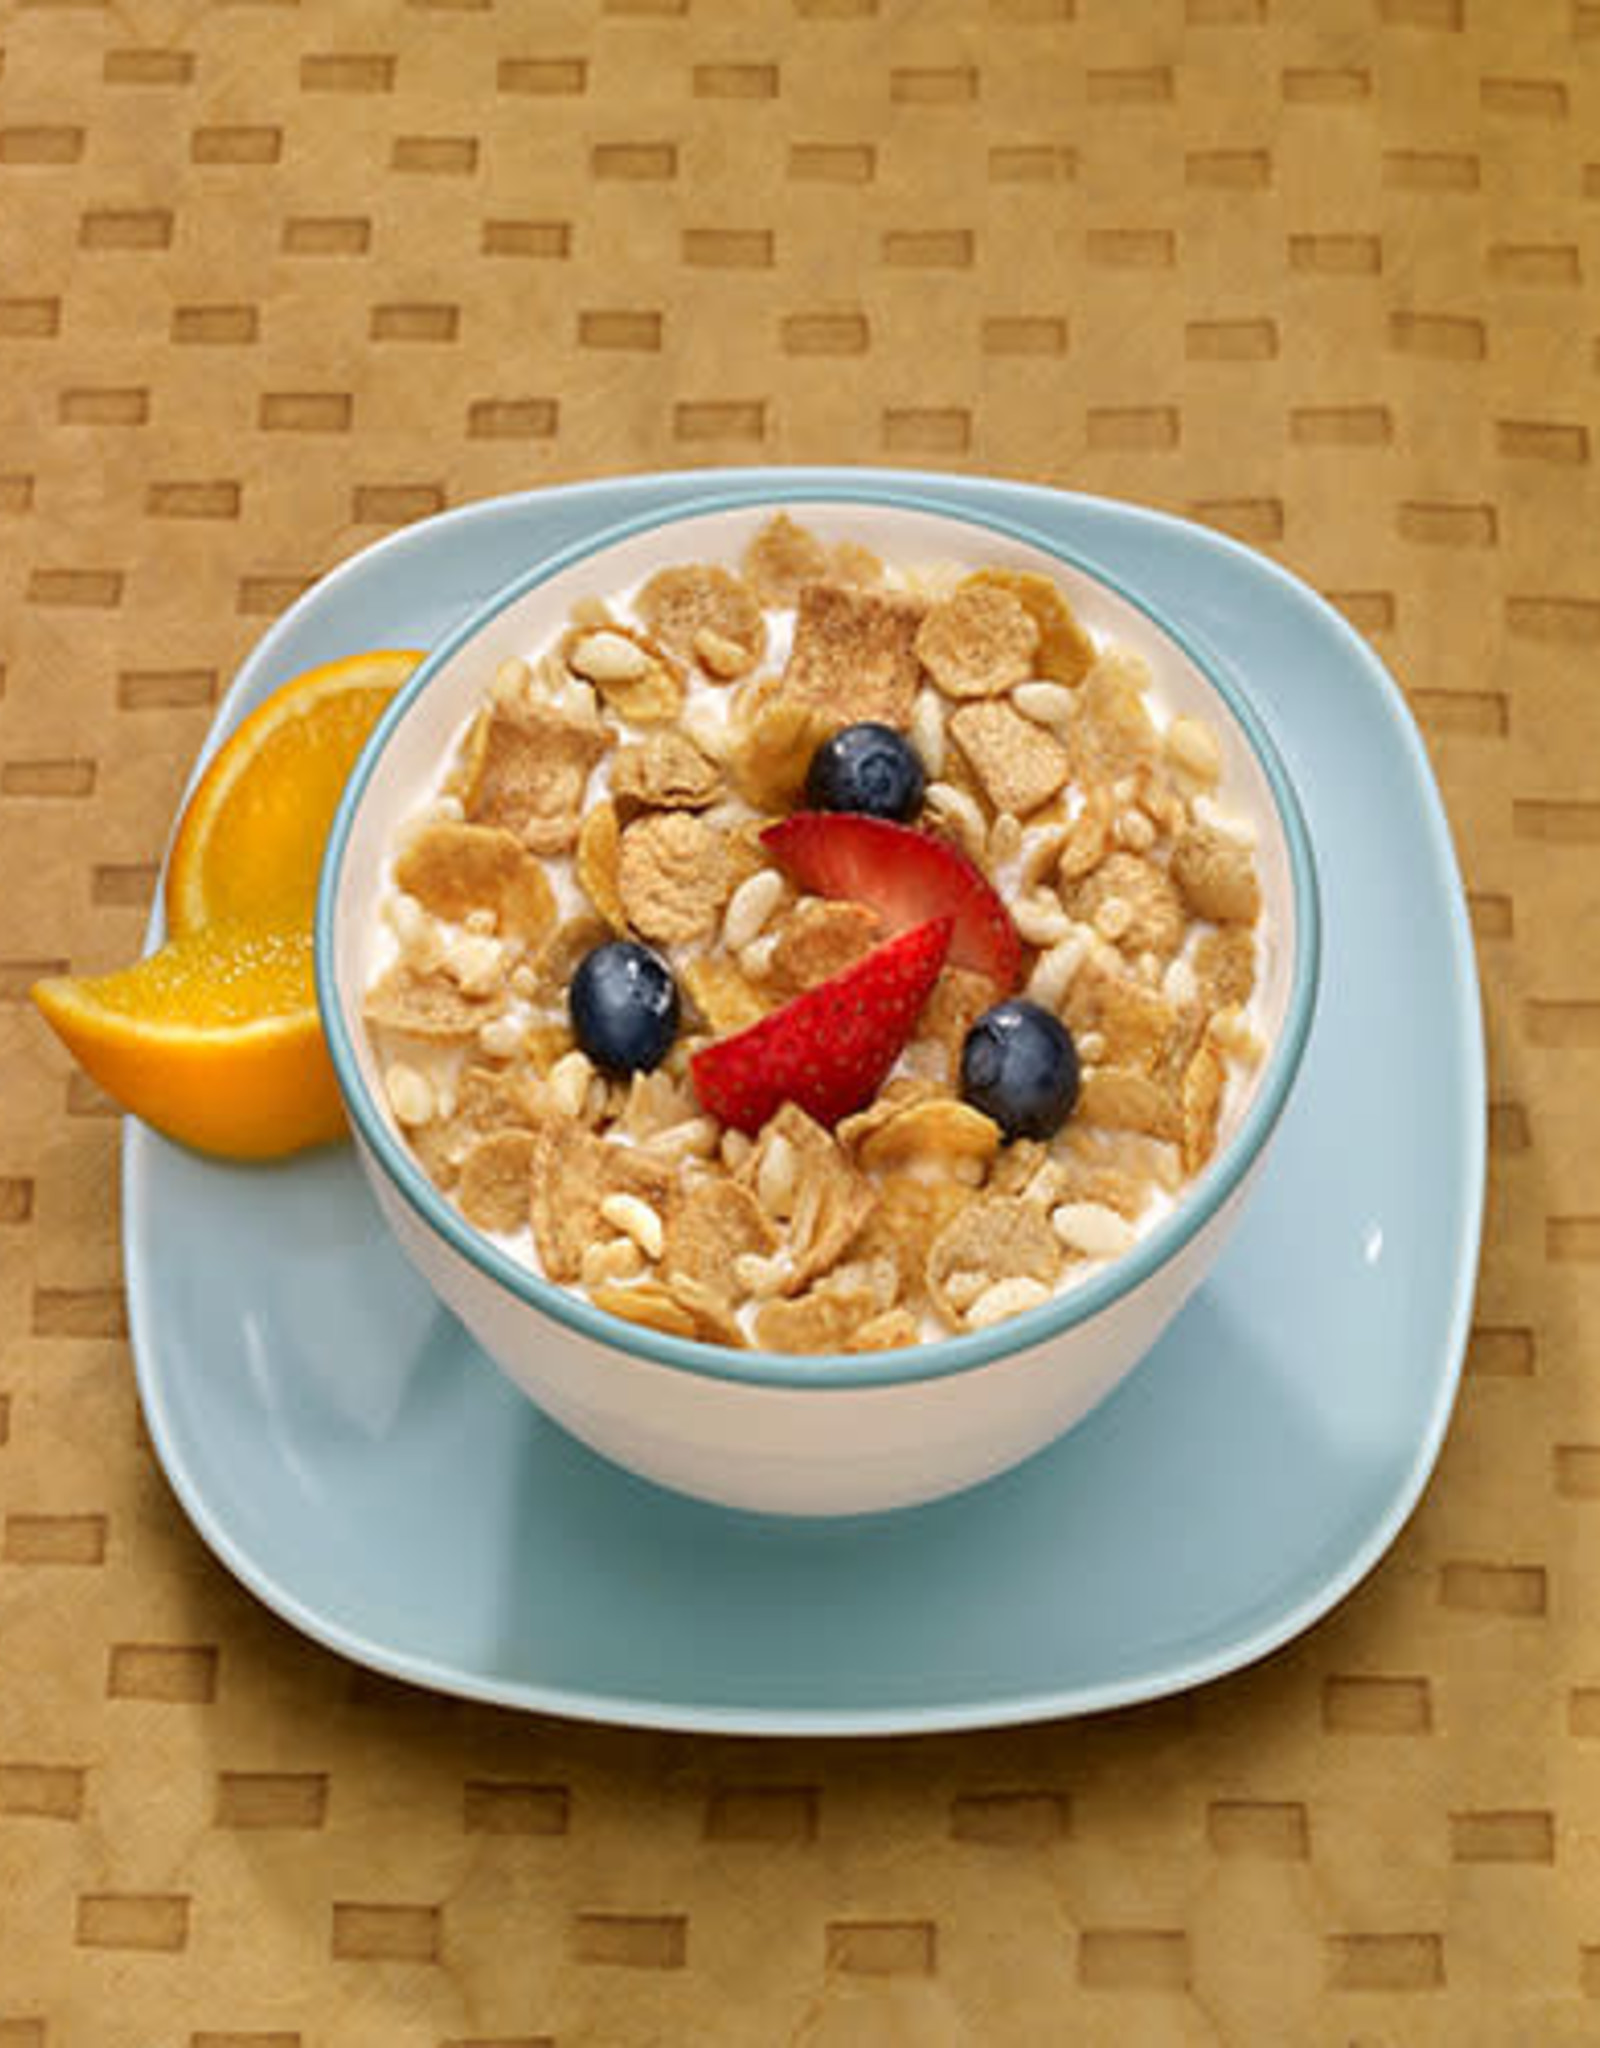 Advanced Laparoscopic Associates Cinnamon Crisp Cereal